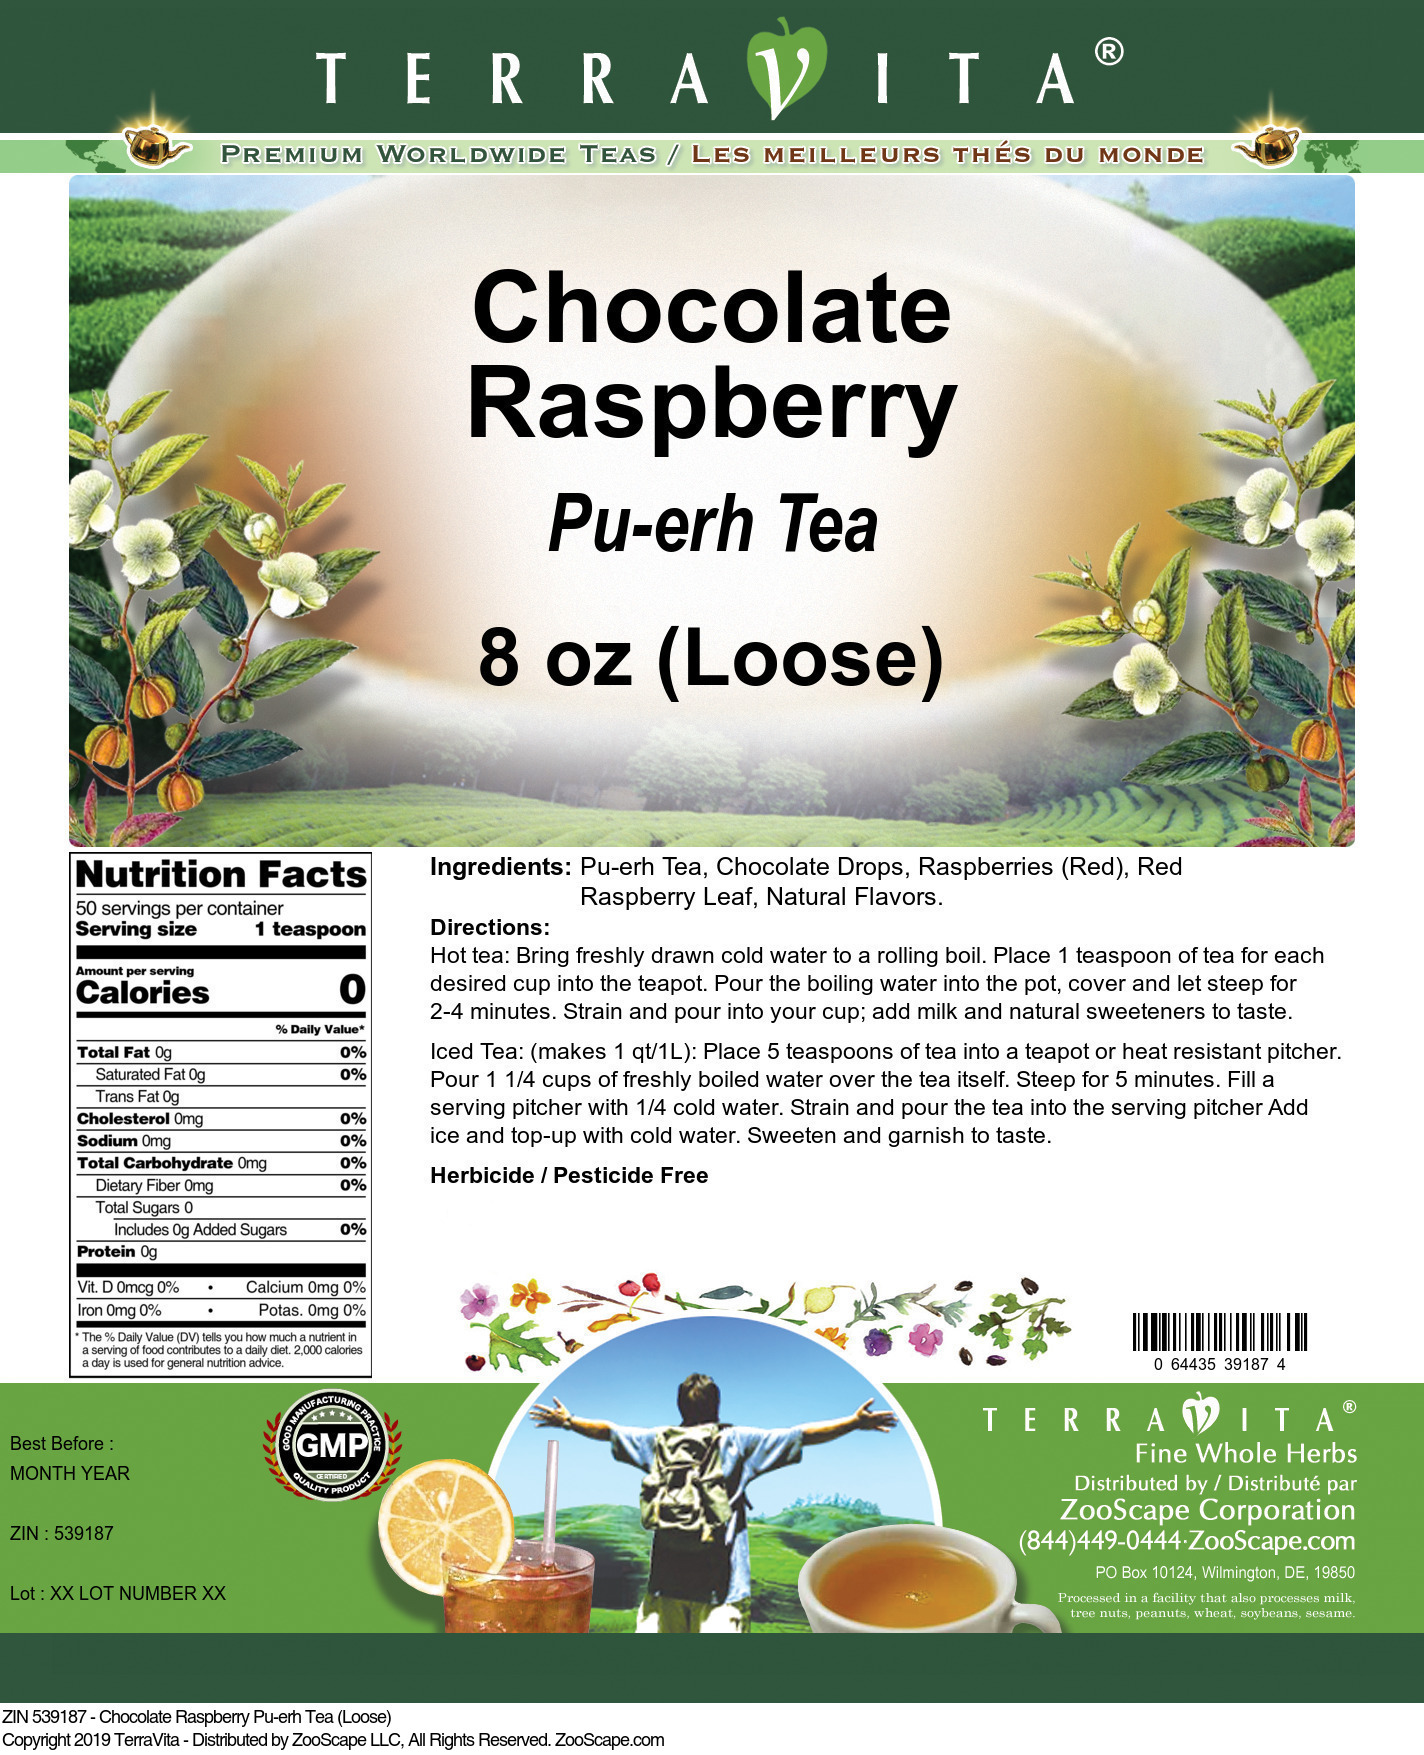 Chocolate Raspberry Pu-erh Tea